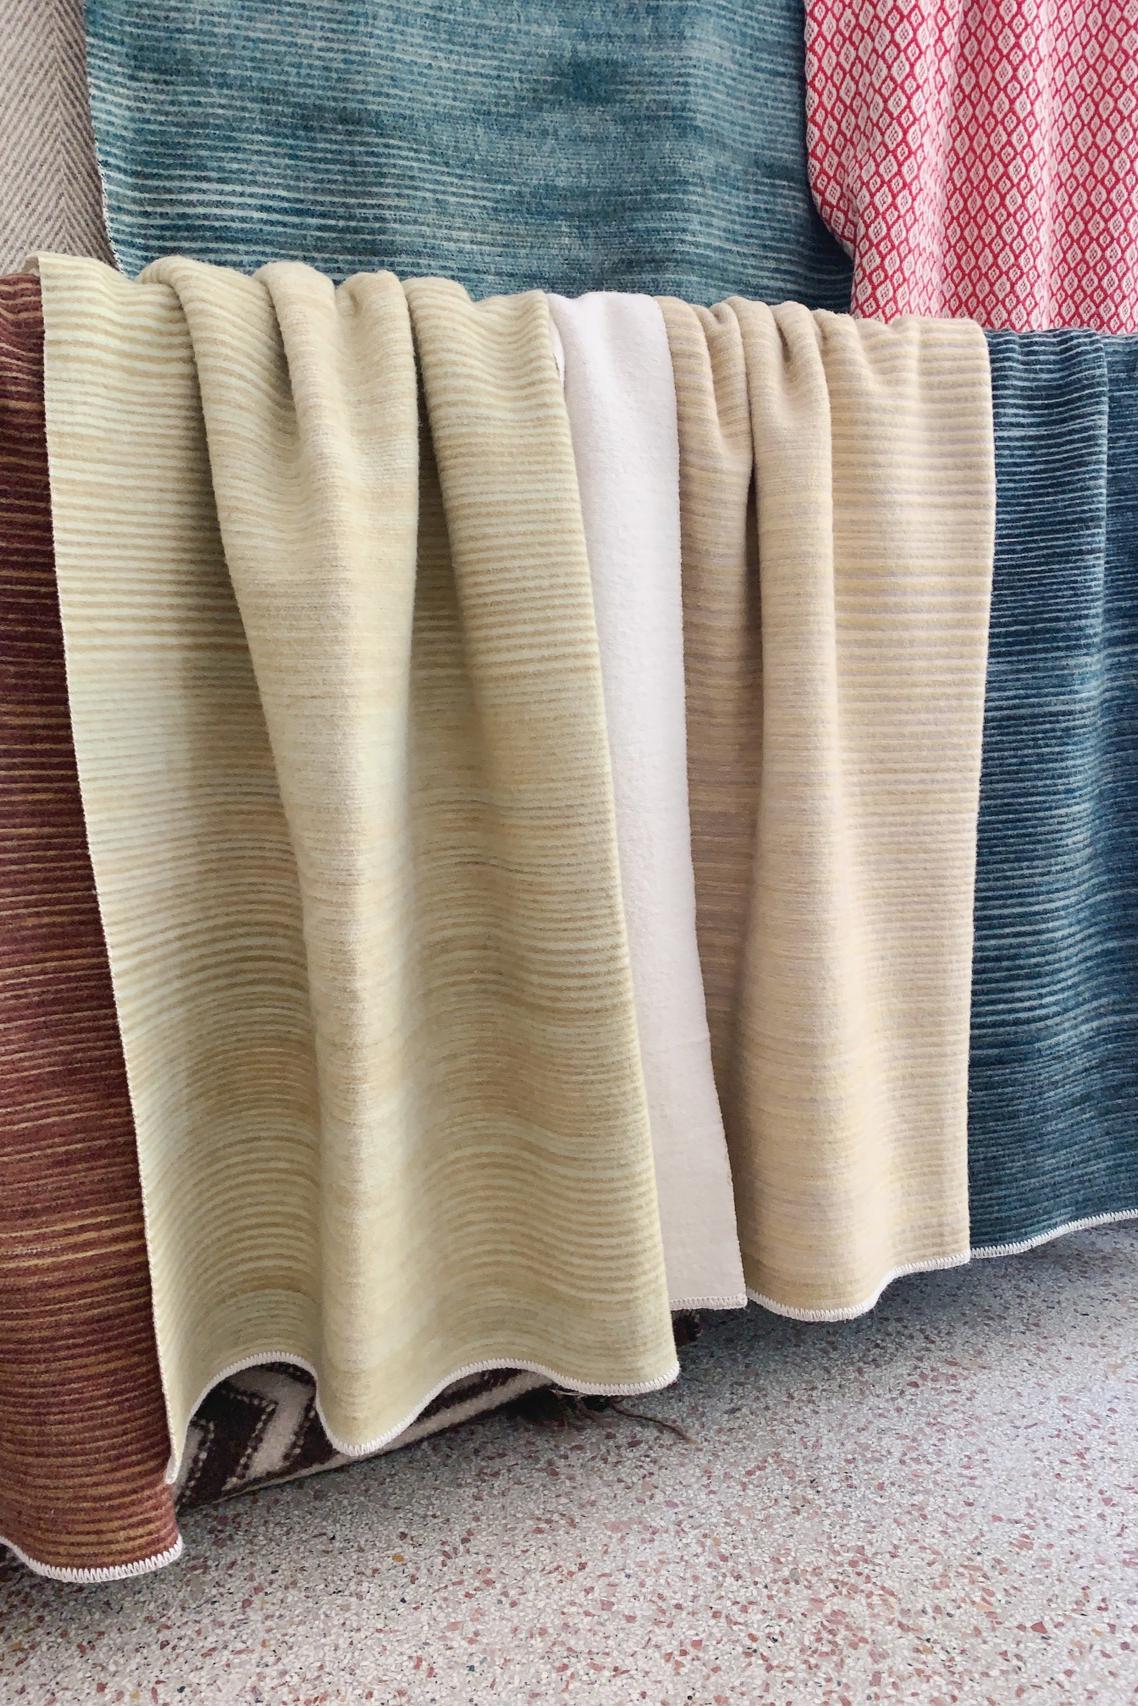 The Doubleside Merino Textilien Wolldecke Farben